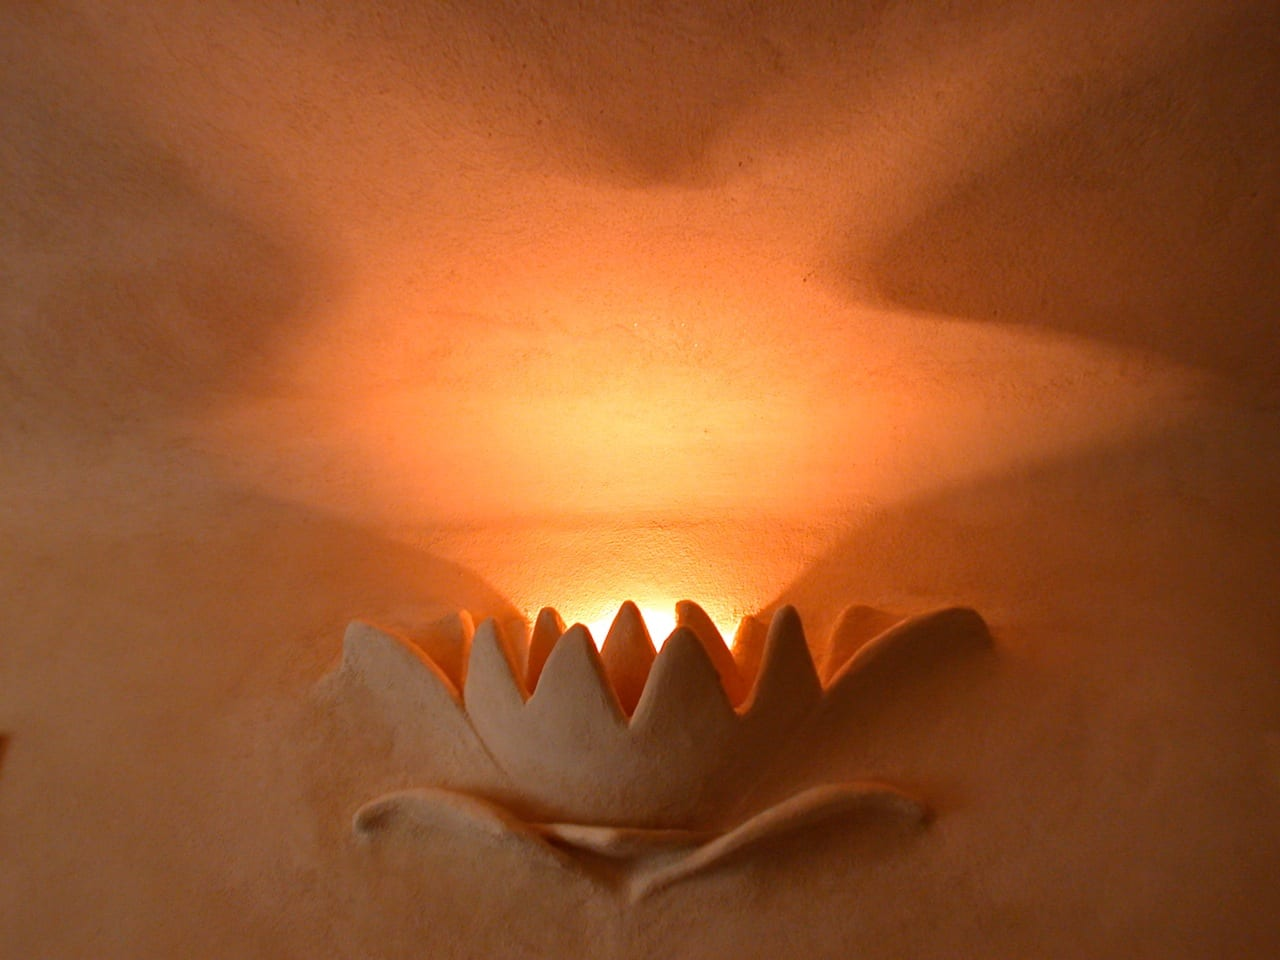 leemstuc leempleister lamp